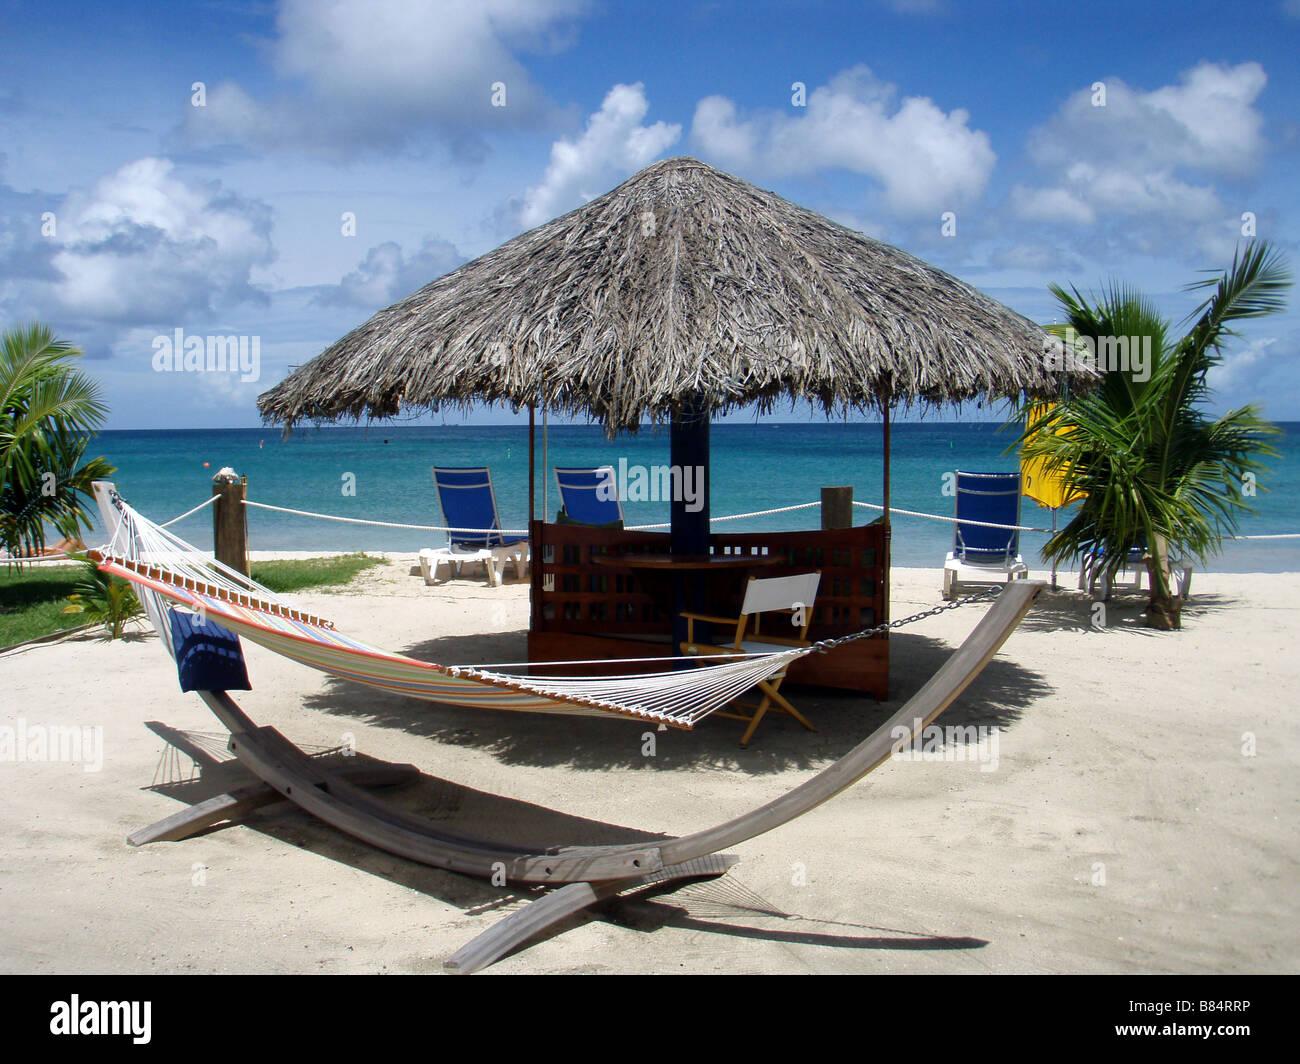 Hammock and Sun Loungers on Grand Anse Beach in the Caribbean Island of Grenada - Stock Image